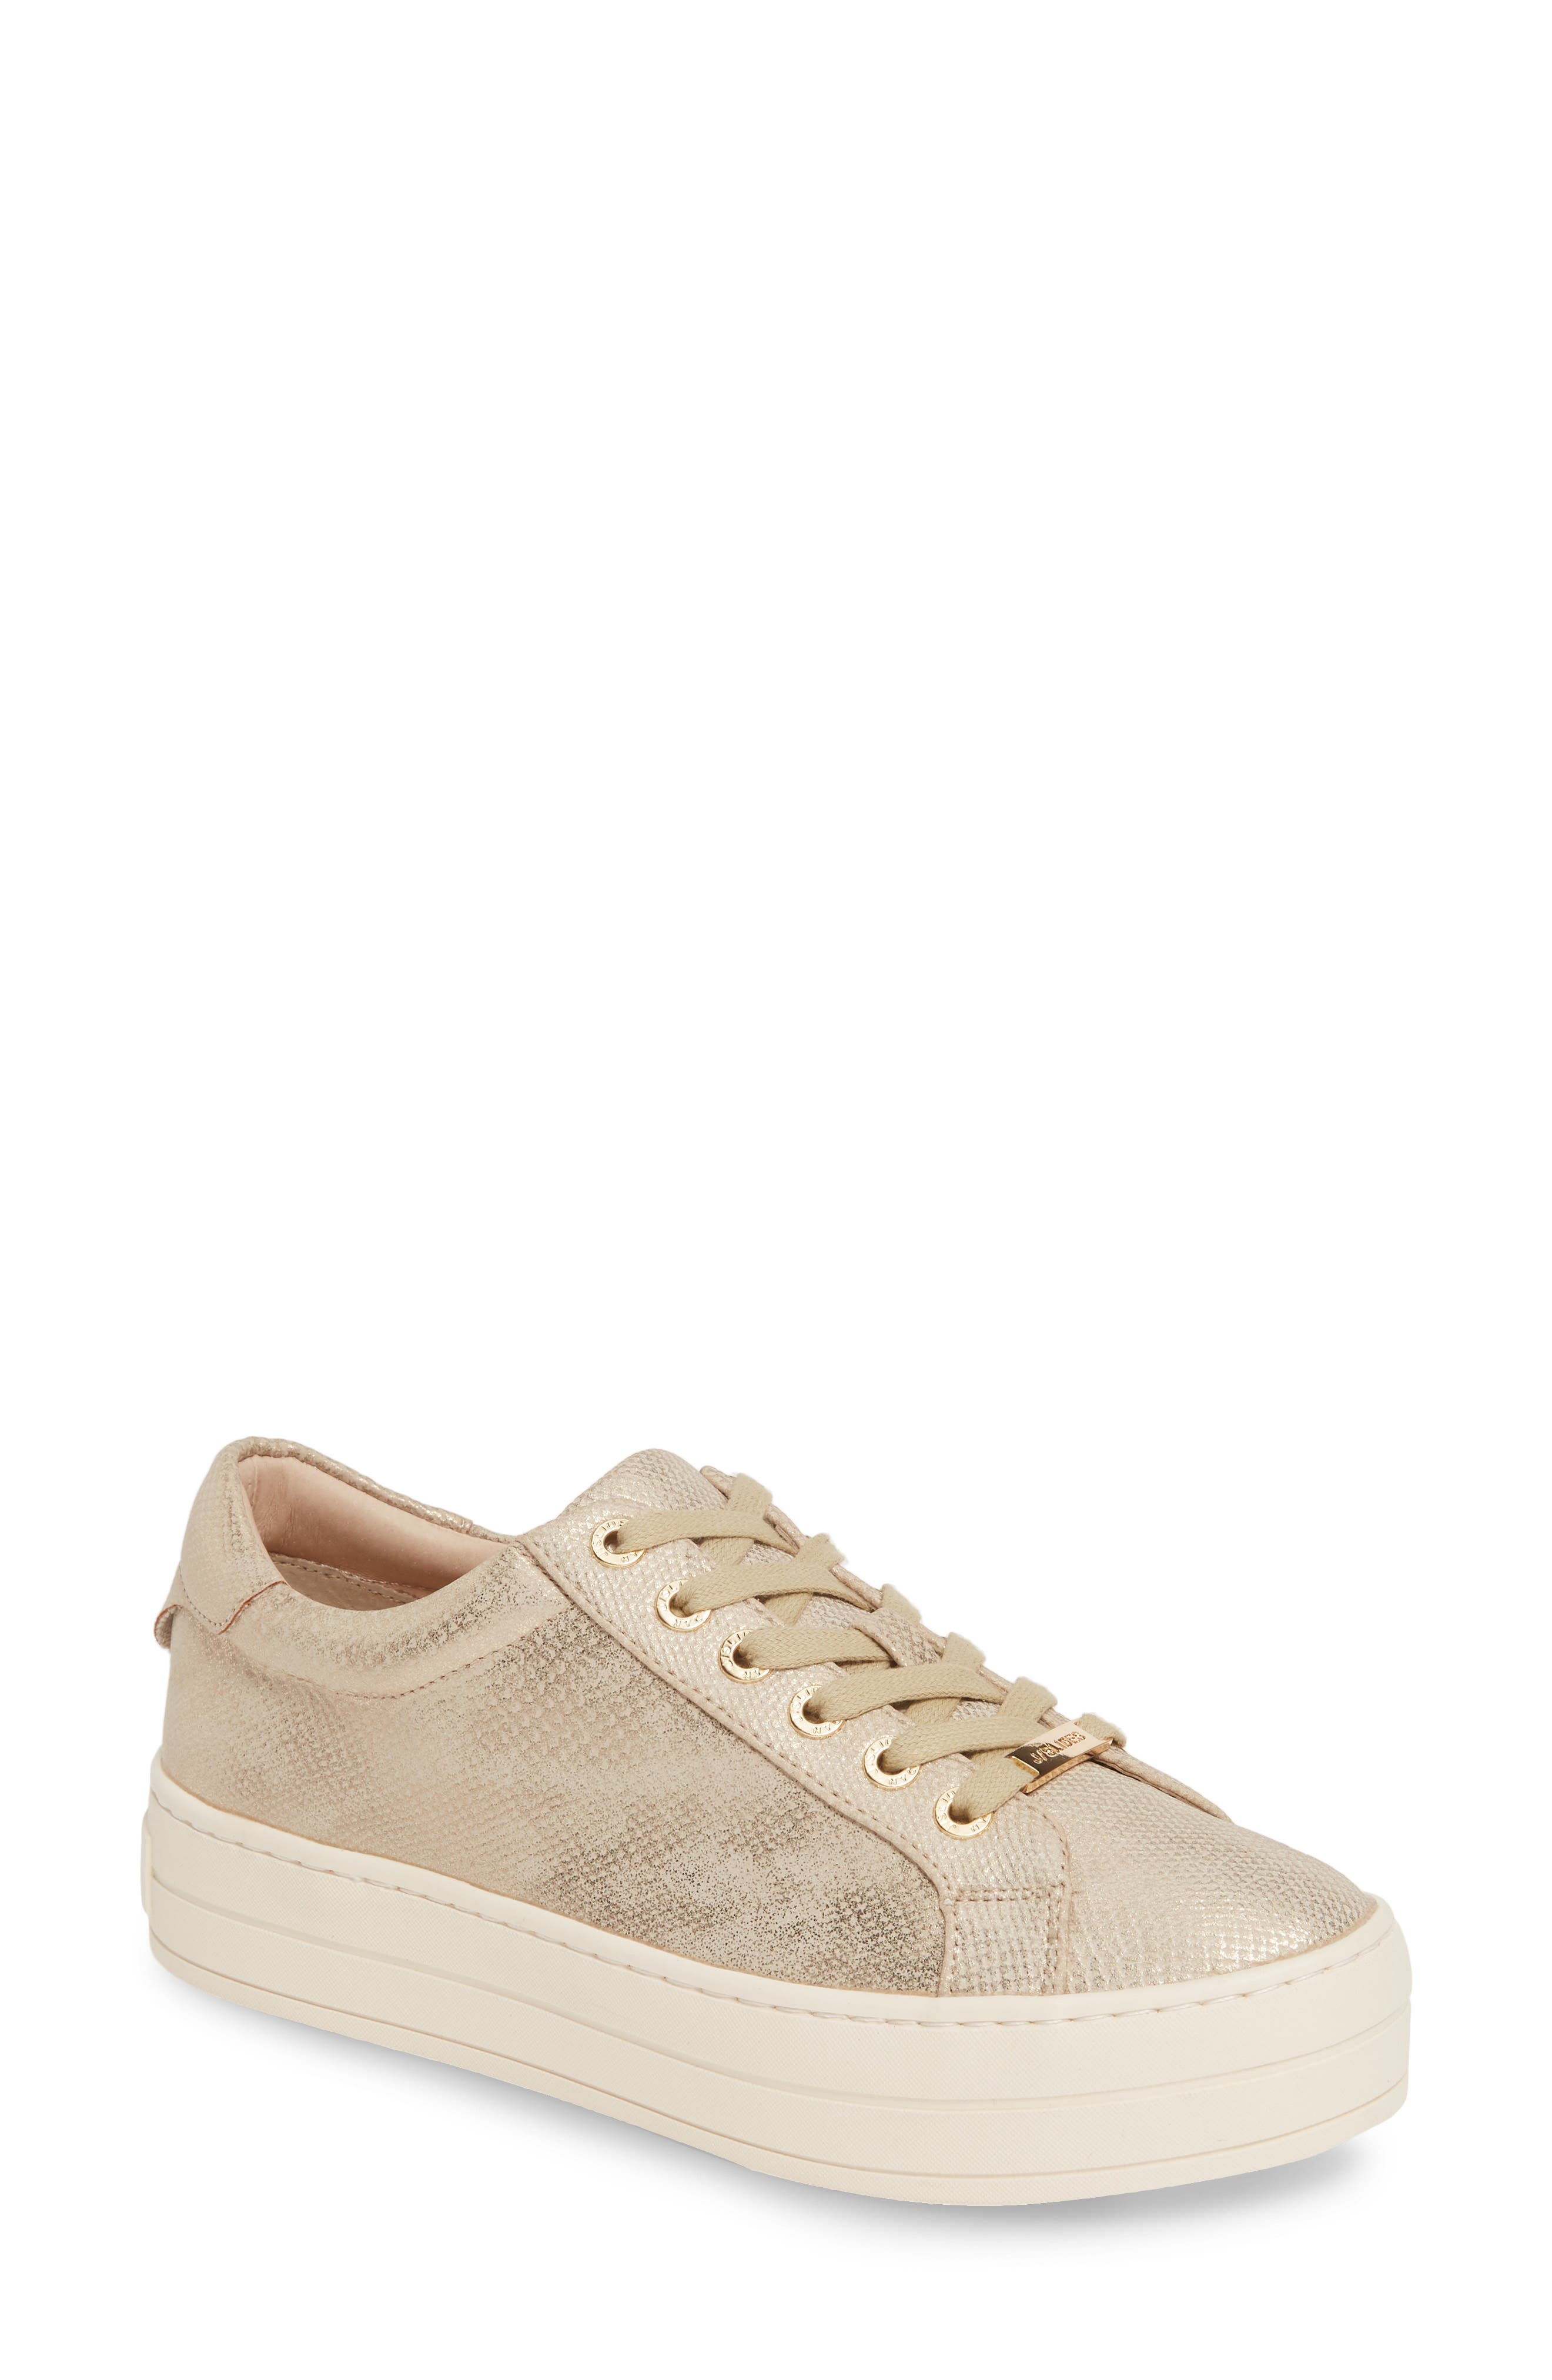 Jslides Hippie Platform Sneaker, Metallic